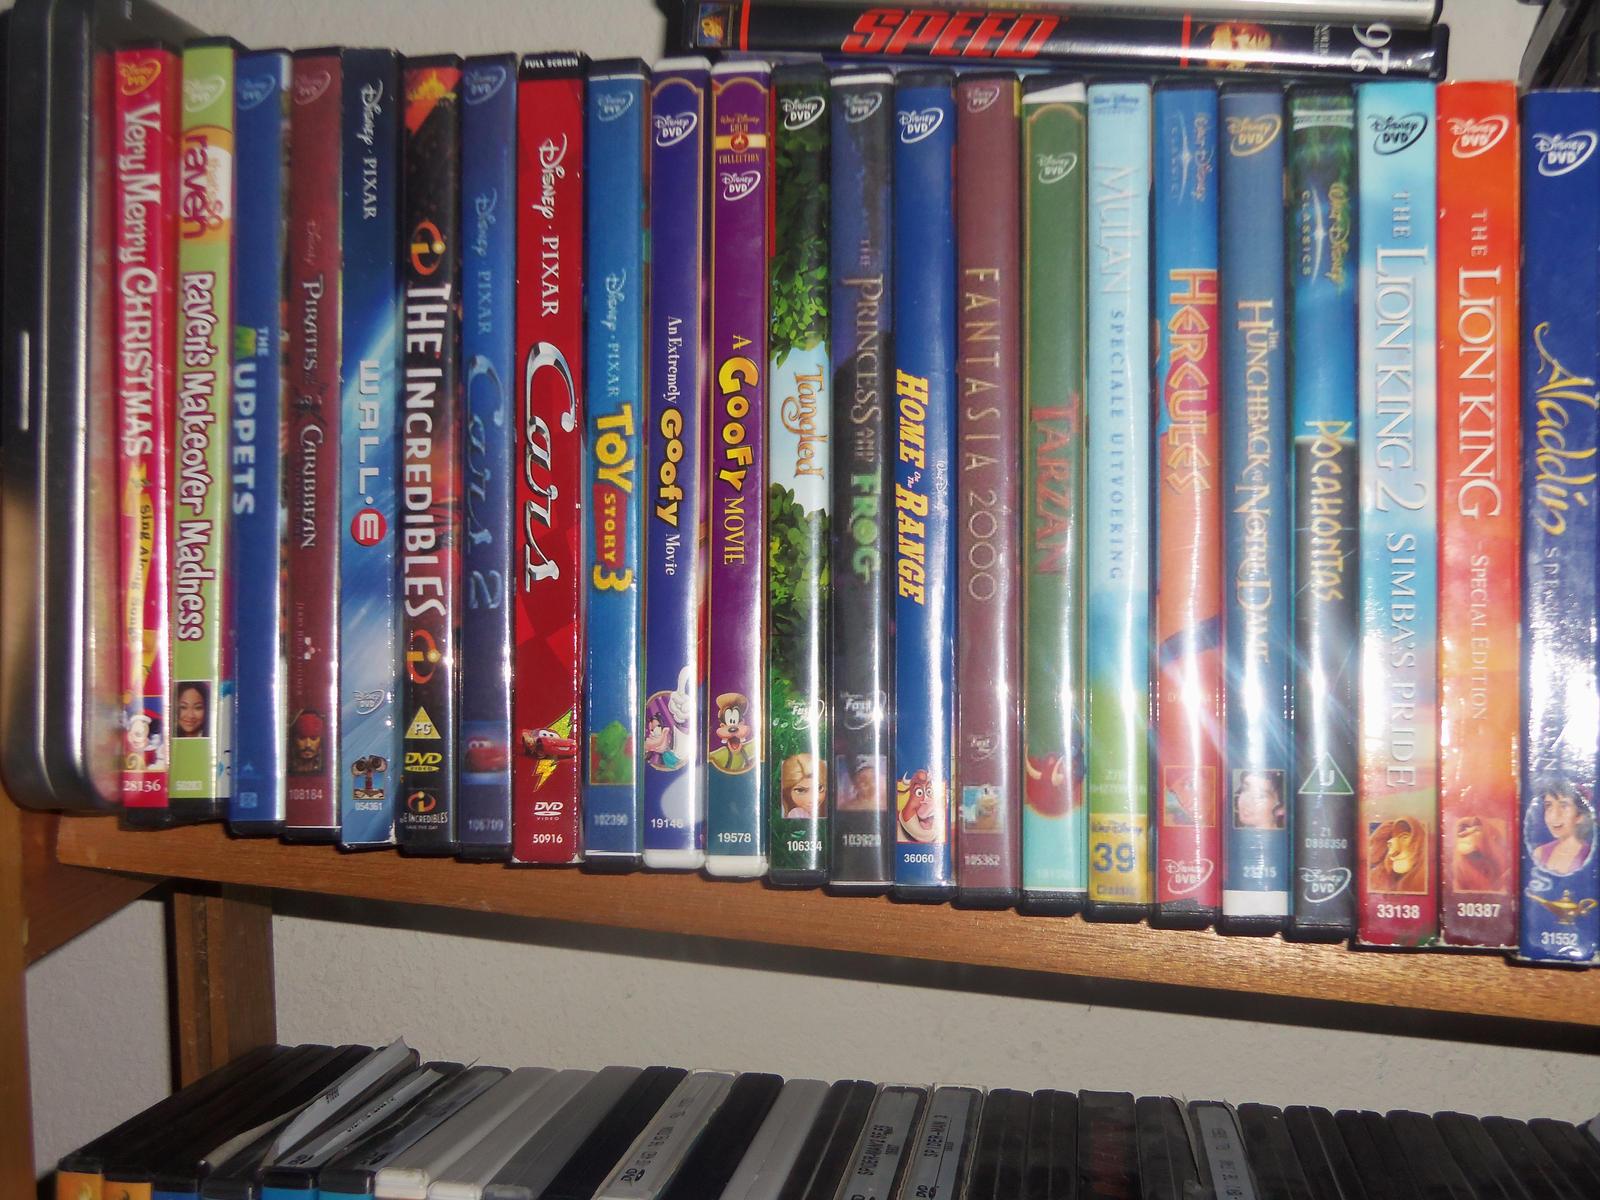 Disney Dvd Collection So Far 2 3 By Bvw1979 On Deviantart